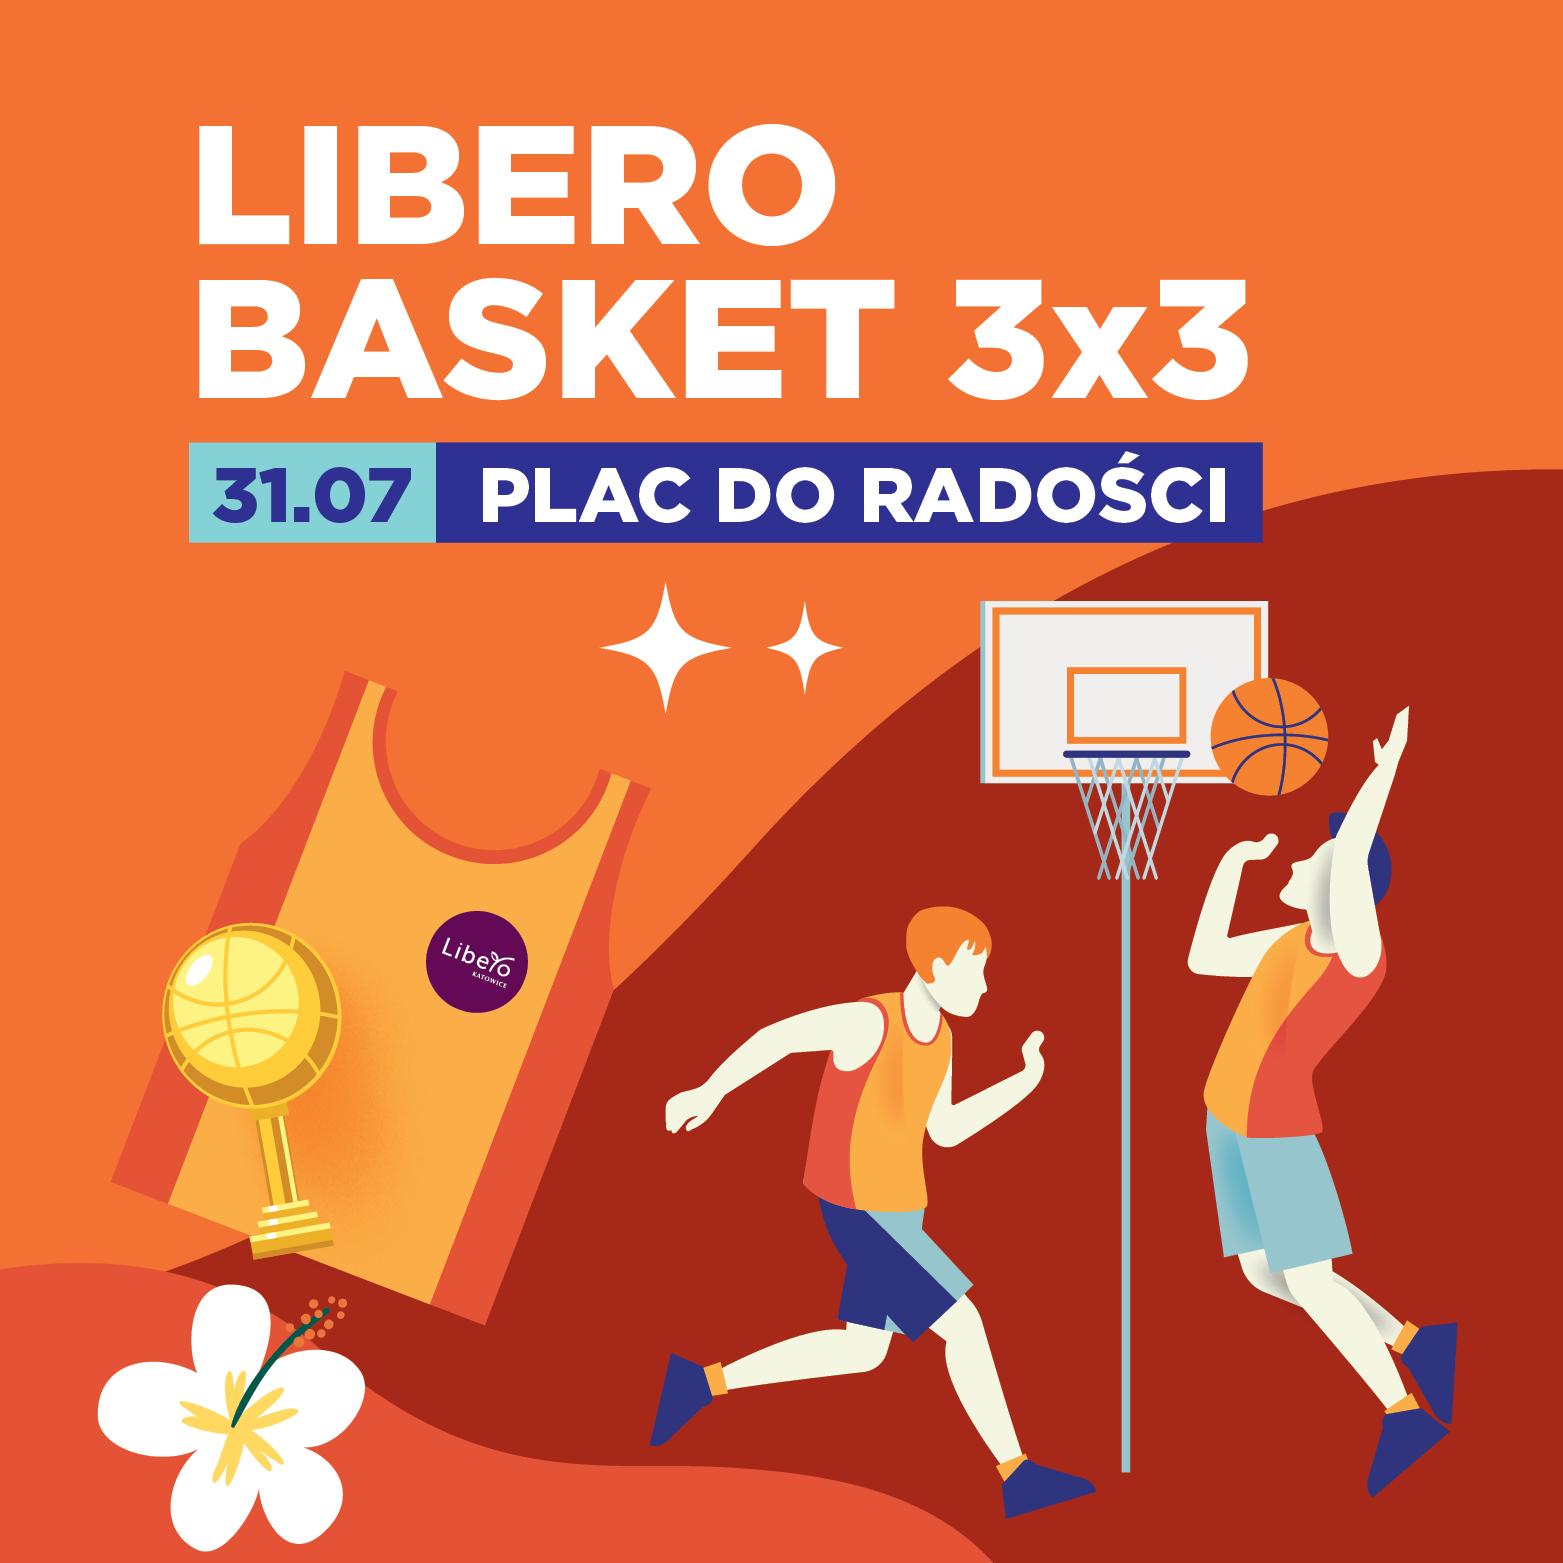 LIBERO BASKET 3×3